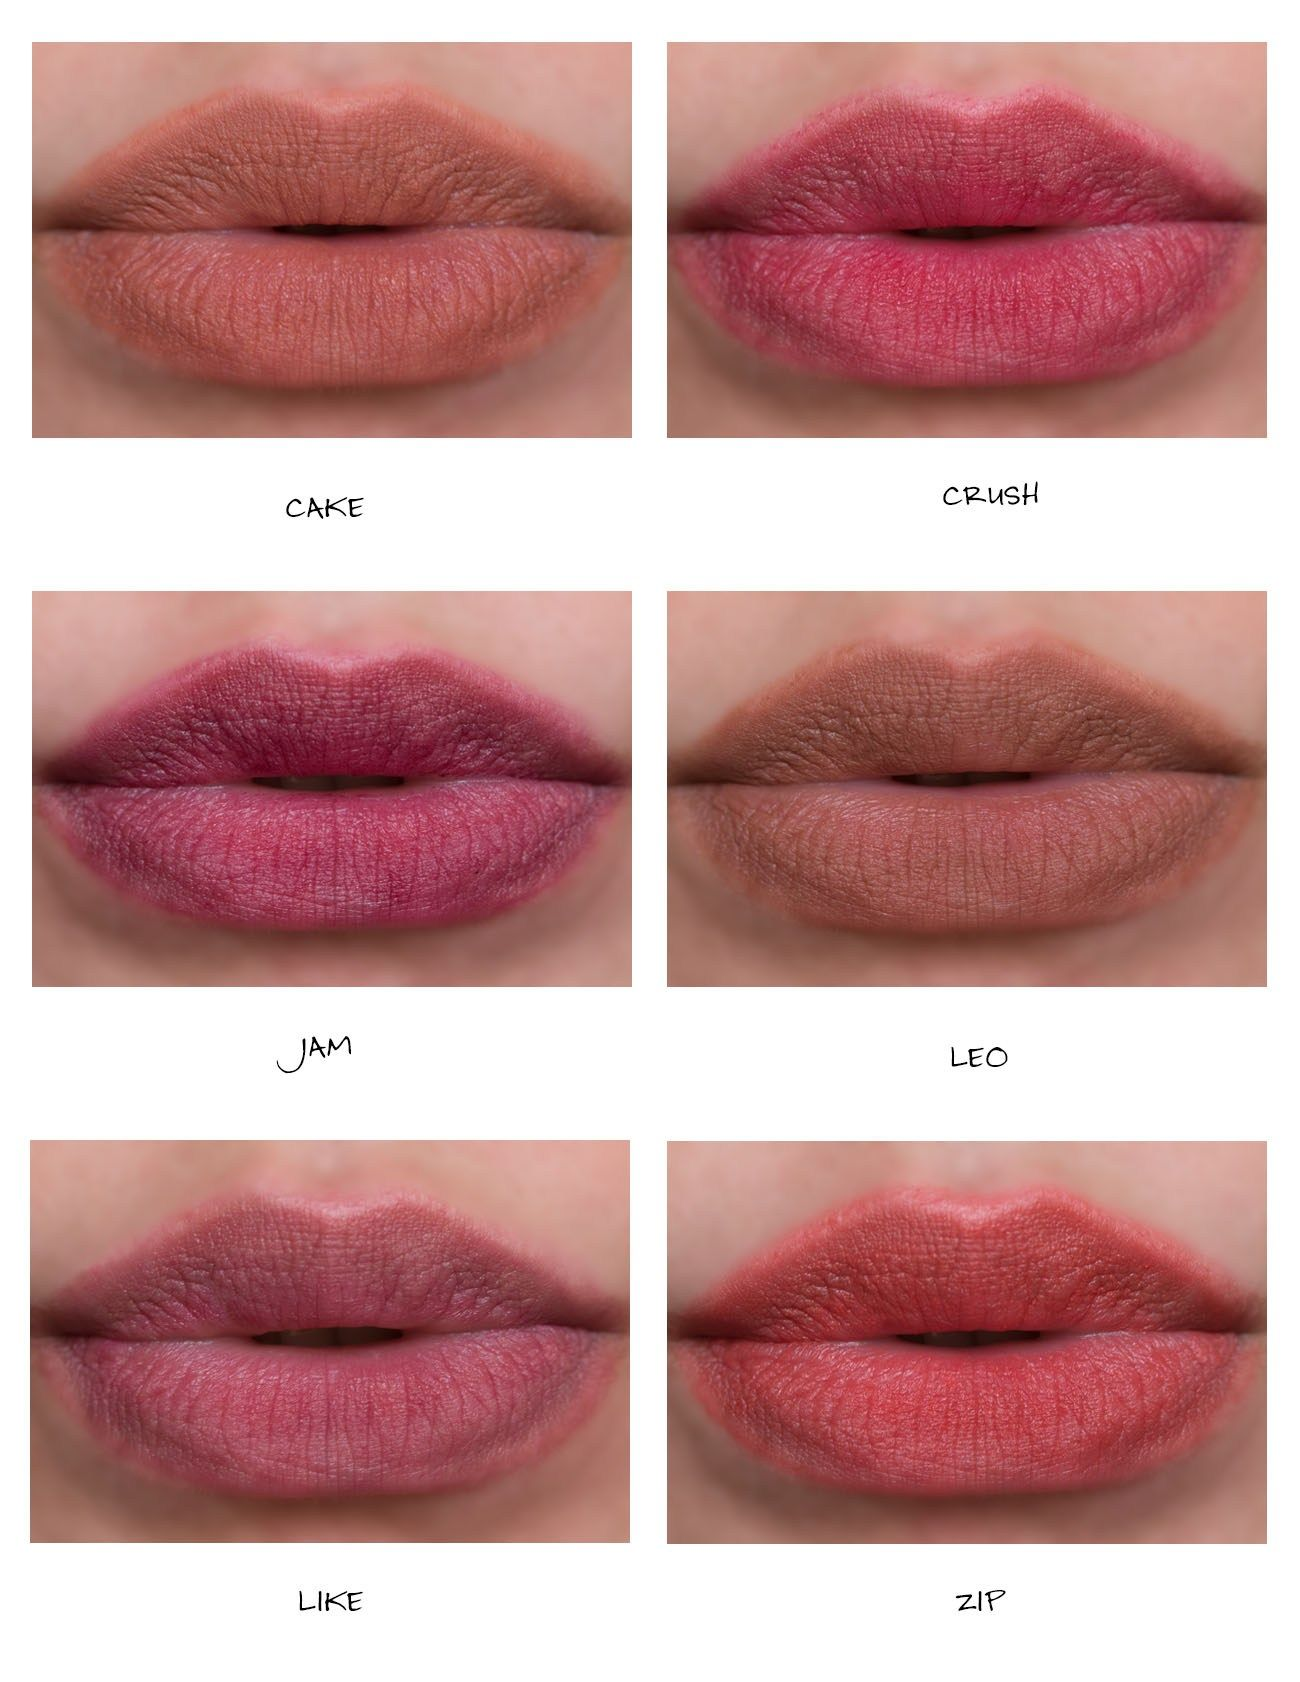 Glossier Generation G New Formula Sheer Matte Lipstick Review